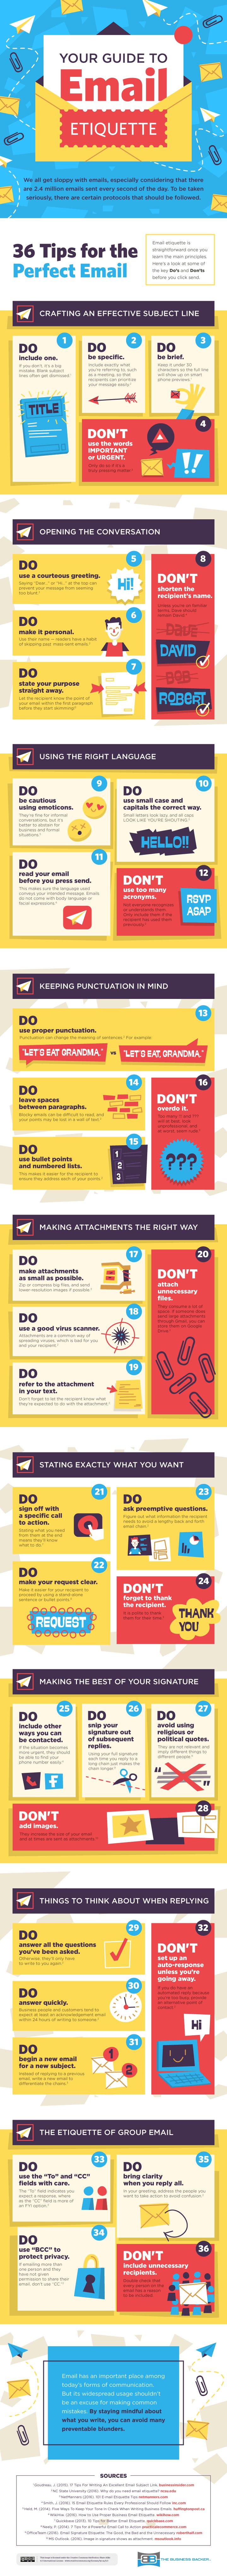 Email-etiquette-guide-v2 (9)